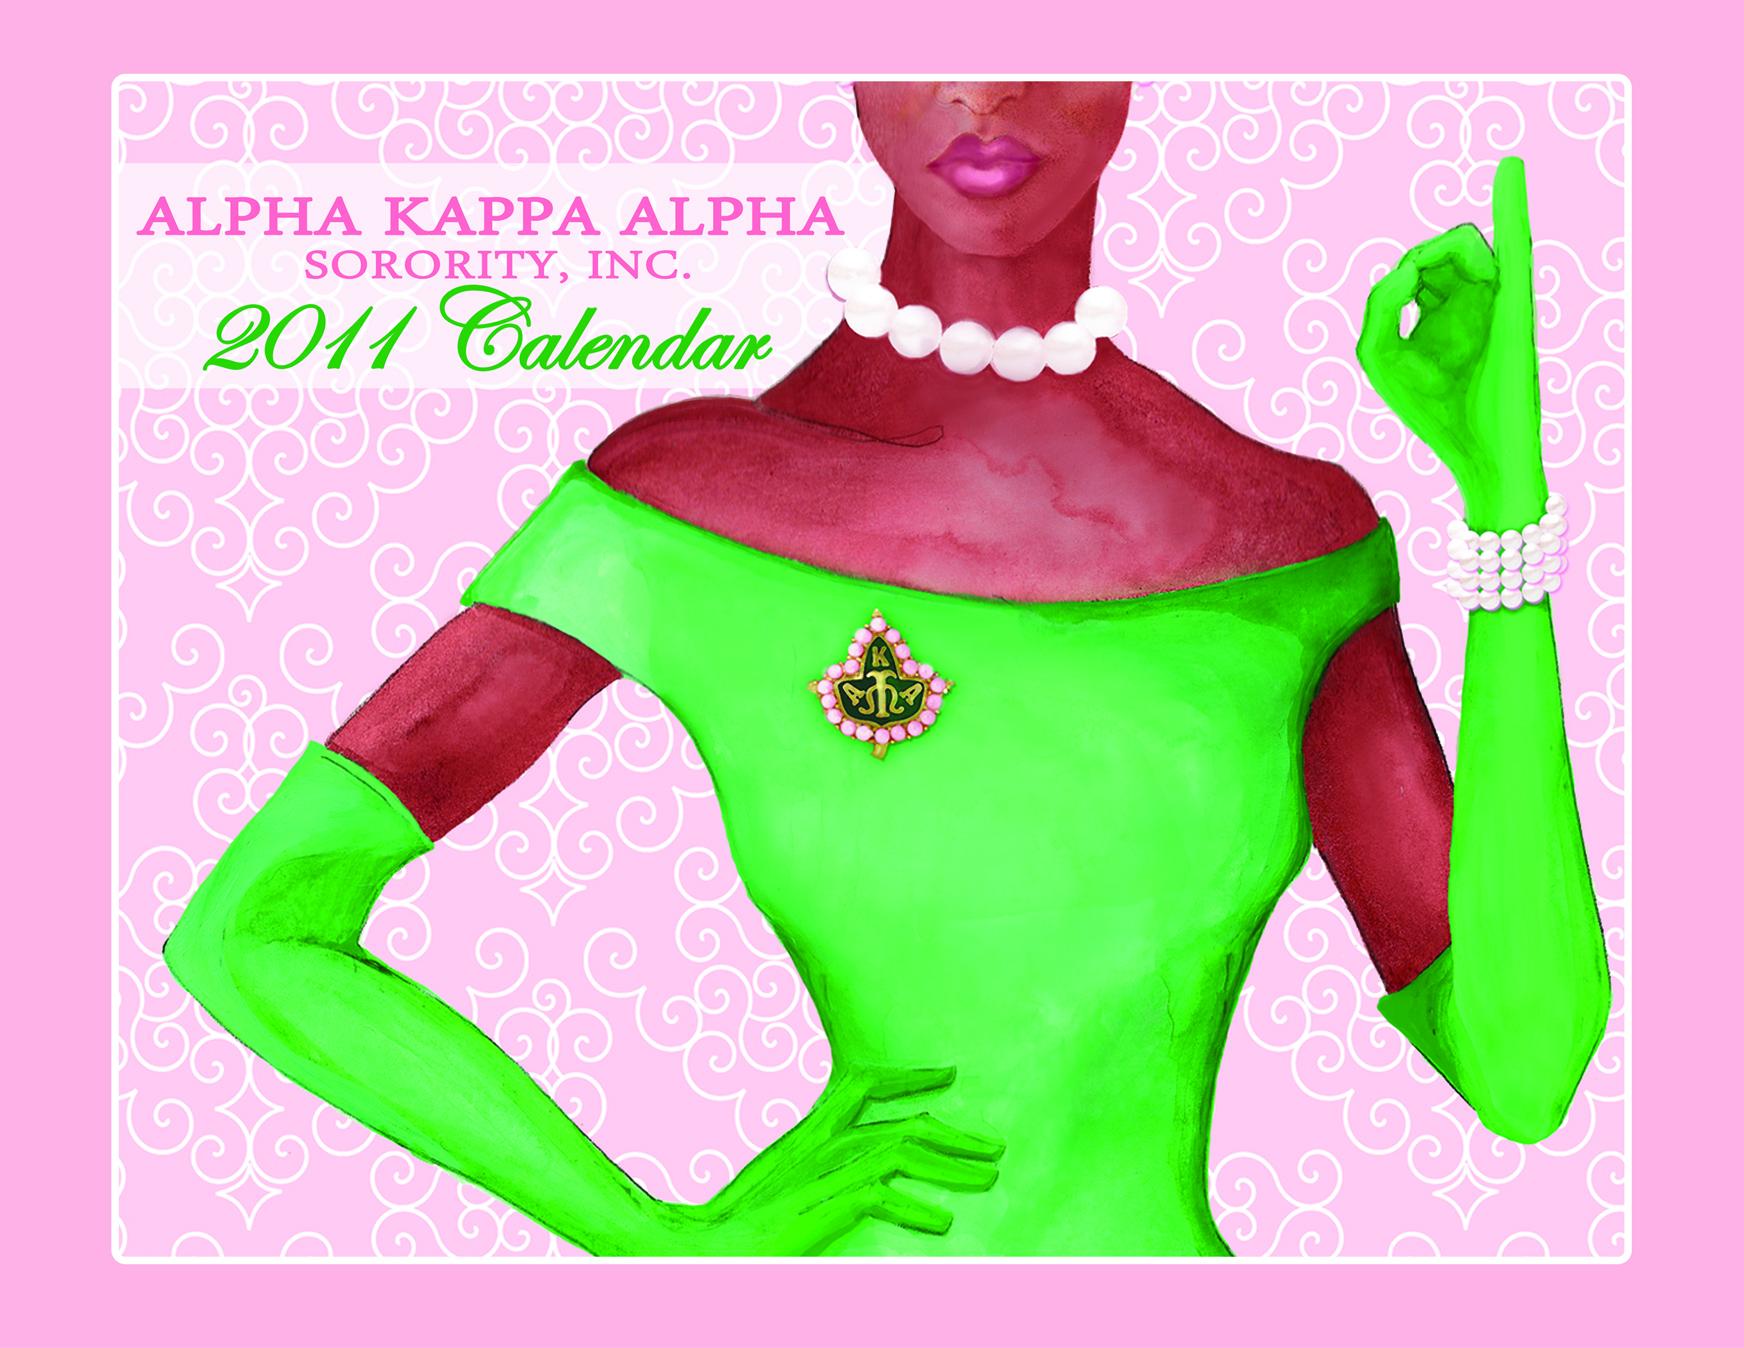 Alpha Kappa Alpha Images Wallpapers Alpha Kappa Alpha Images 1744x1348